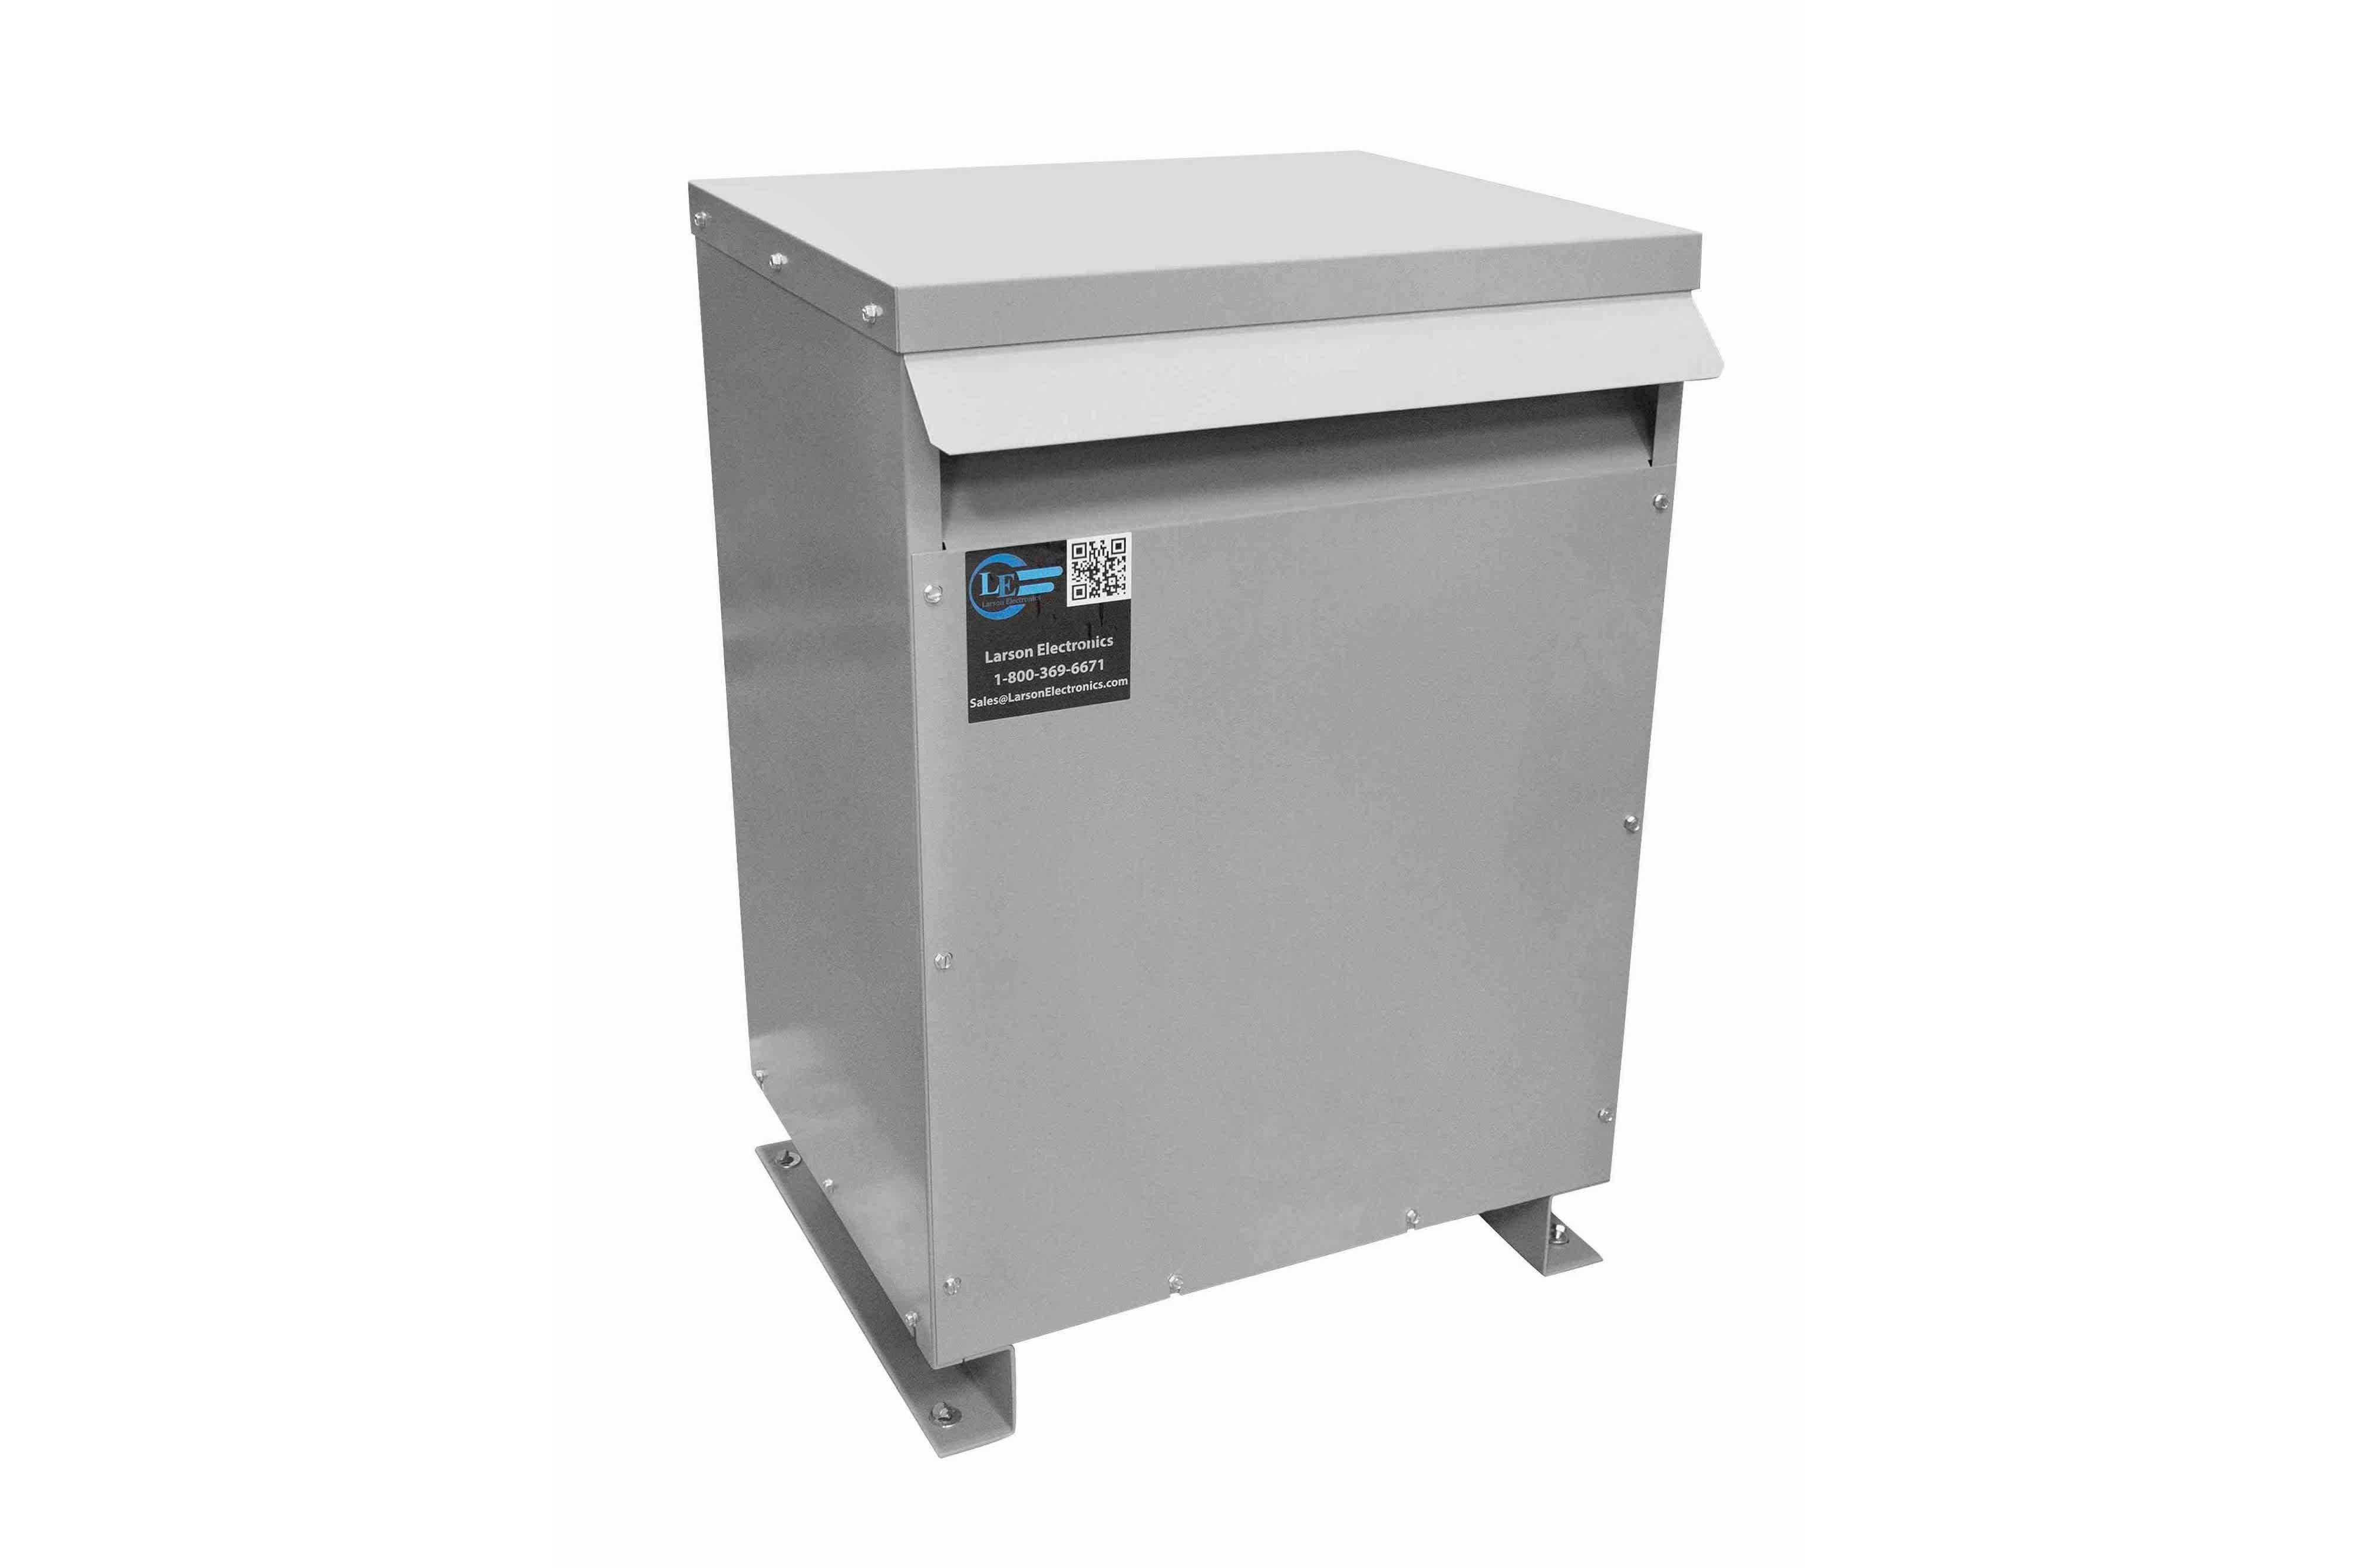 26 kVA 3PH Isolation Transformer, 208V Wye Primary, 600Y/347 Wye-N Secondary, N3R, Ventilated, 60 Hz